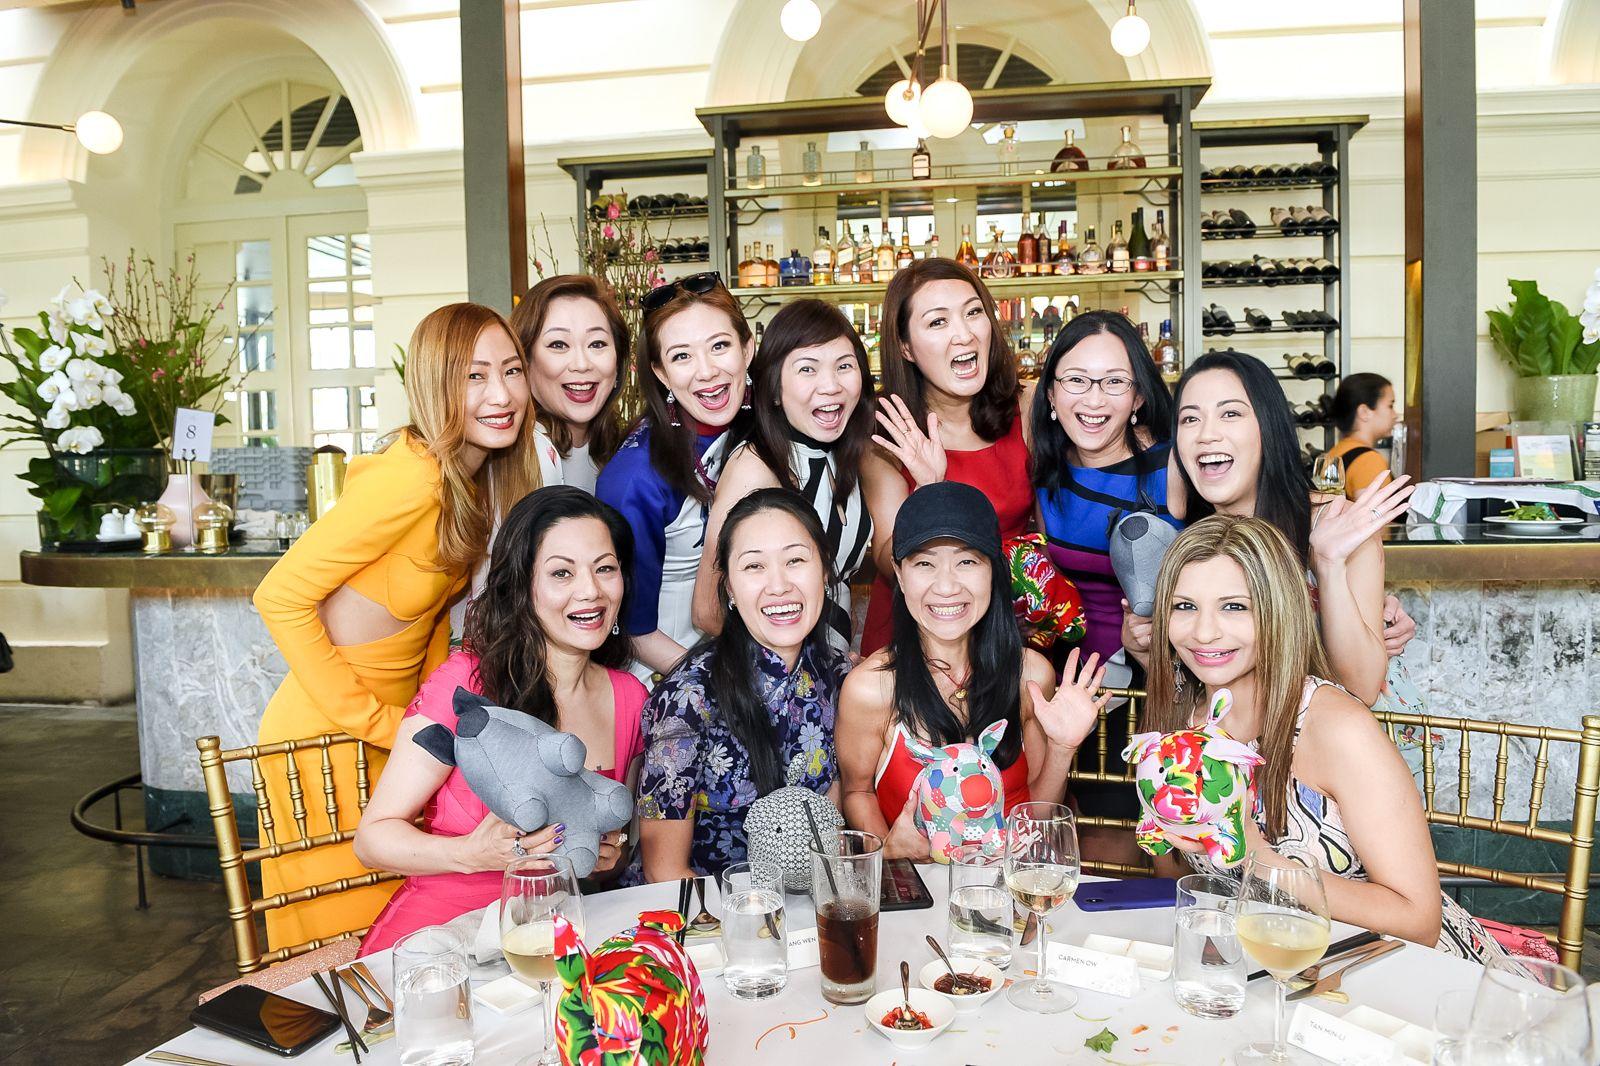 Tan Min-Li, Cheryl Lee, Stephanie Lee, Shirley Crystal Chua, Nana Au-Chua, Caroline Low-Heah, Carmen Ow, Suguna Madhaven, Tang Wen Li, Dana Cheong, Rasina Rubin